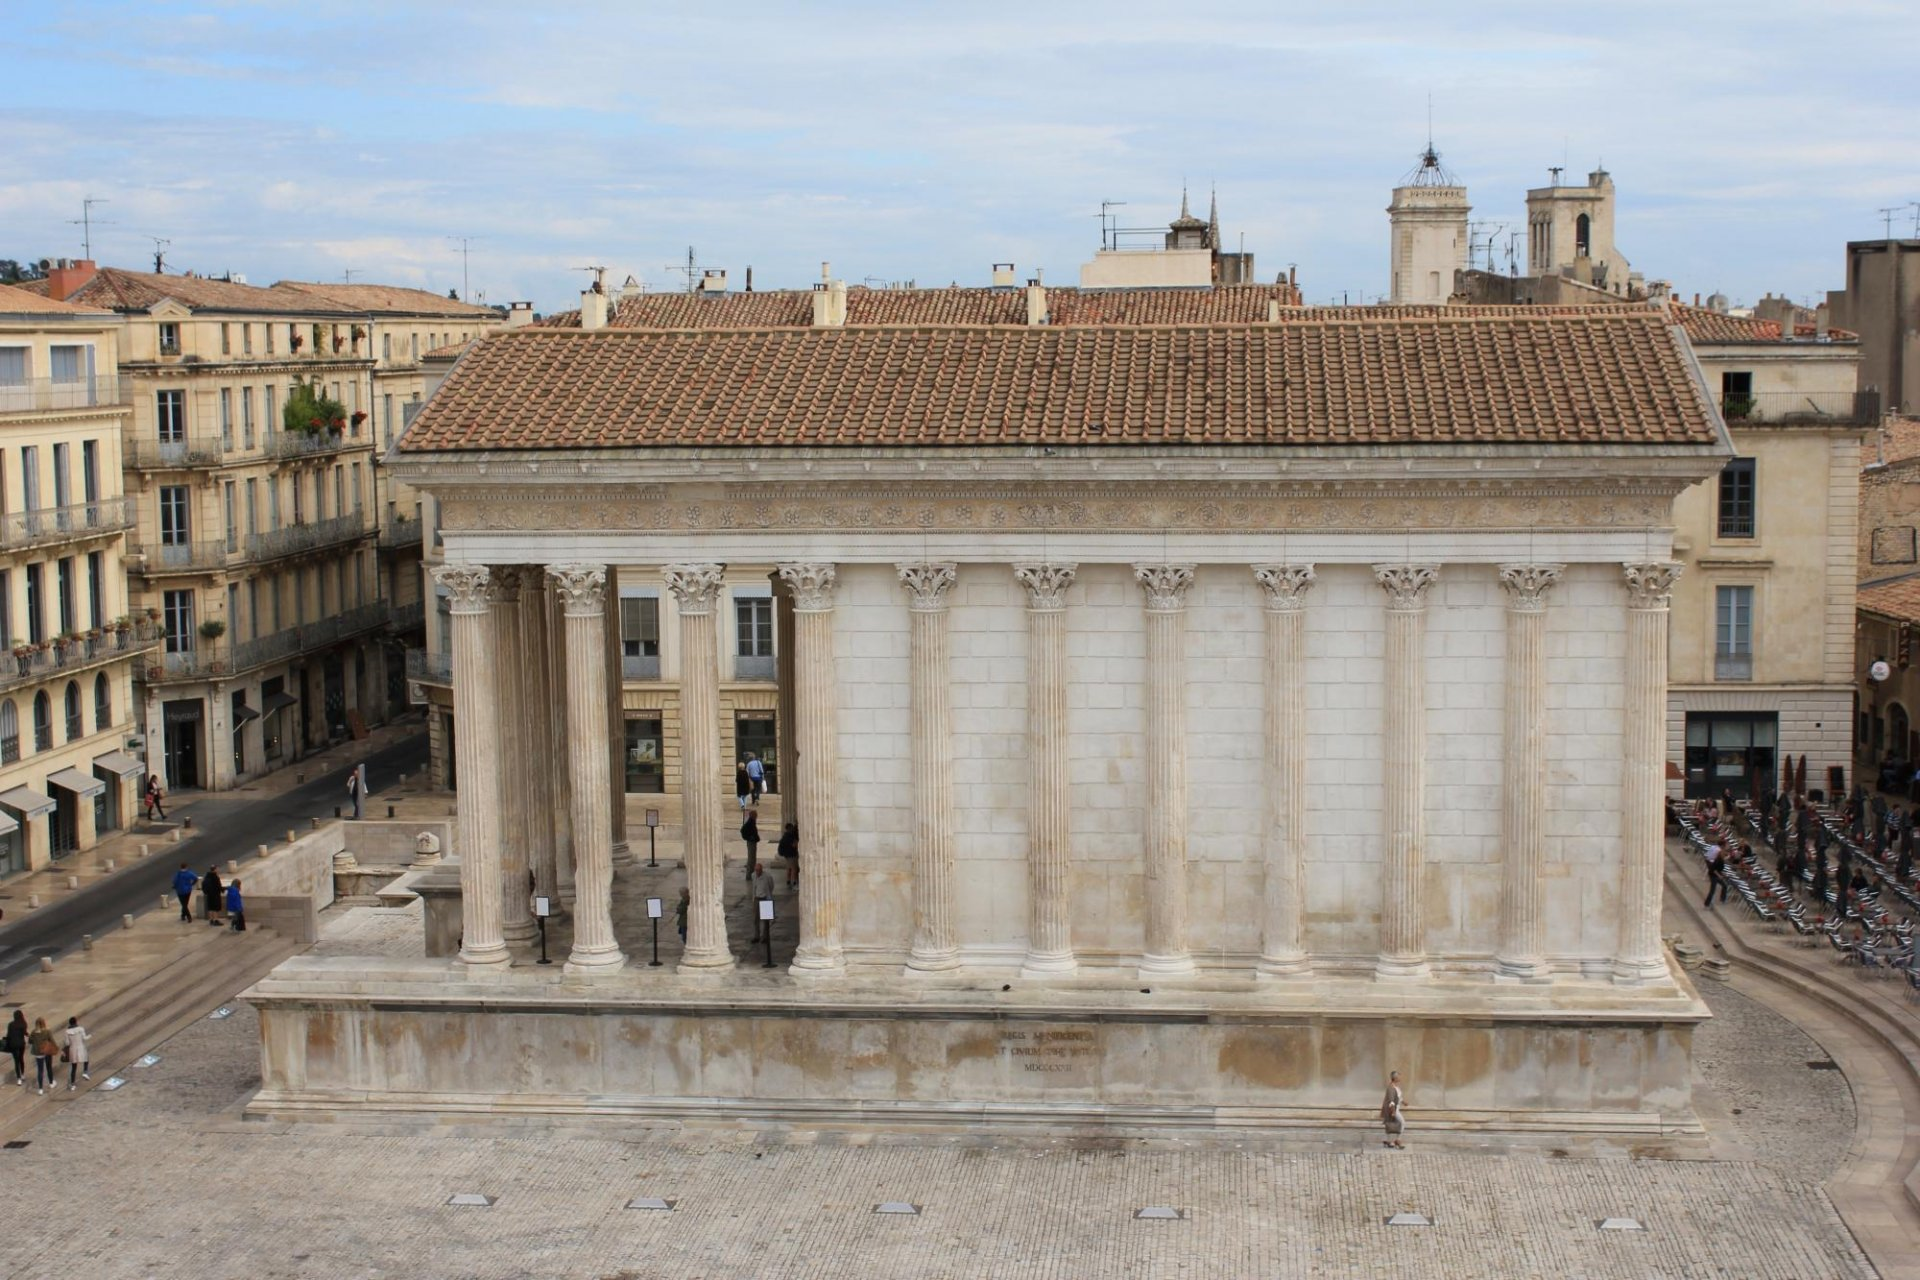 Le Ciel de Nîmes